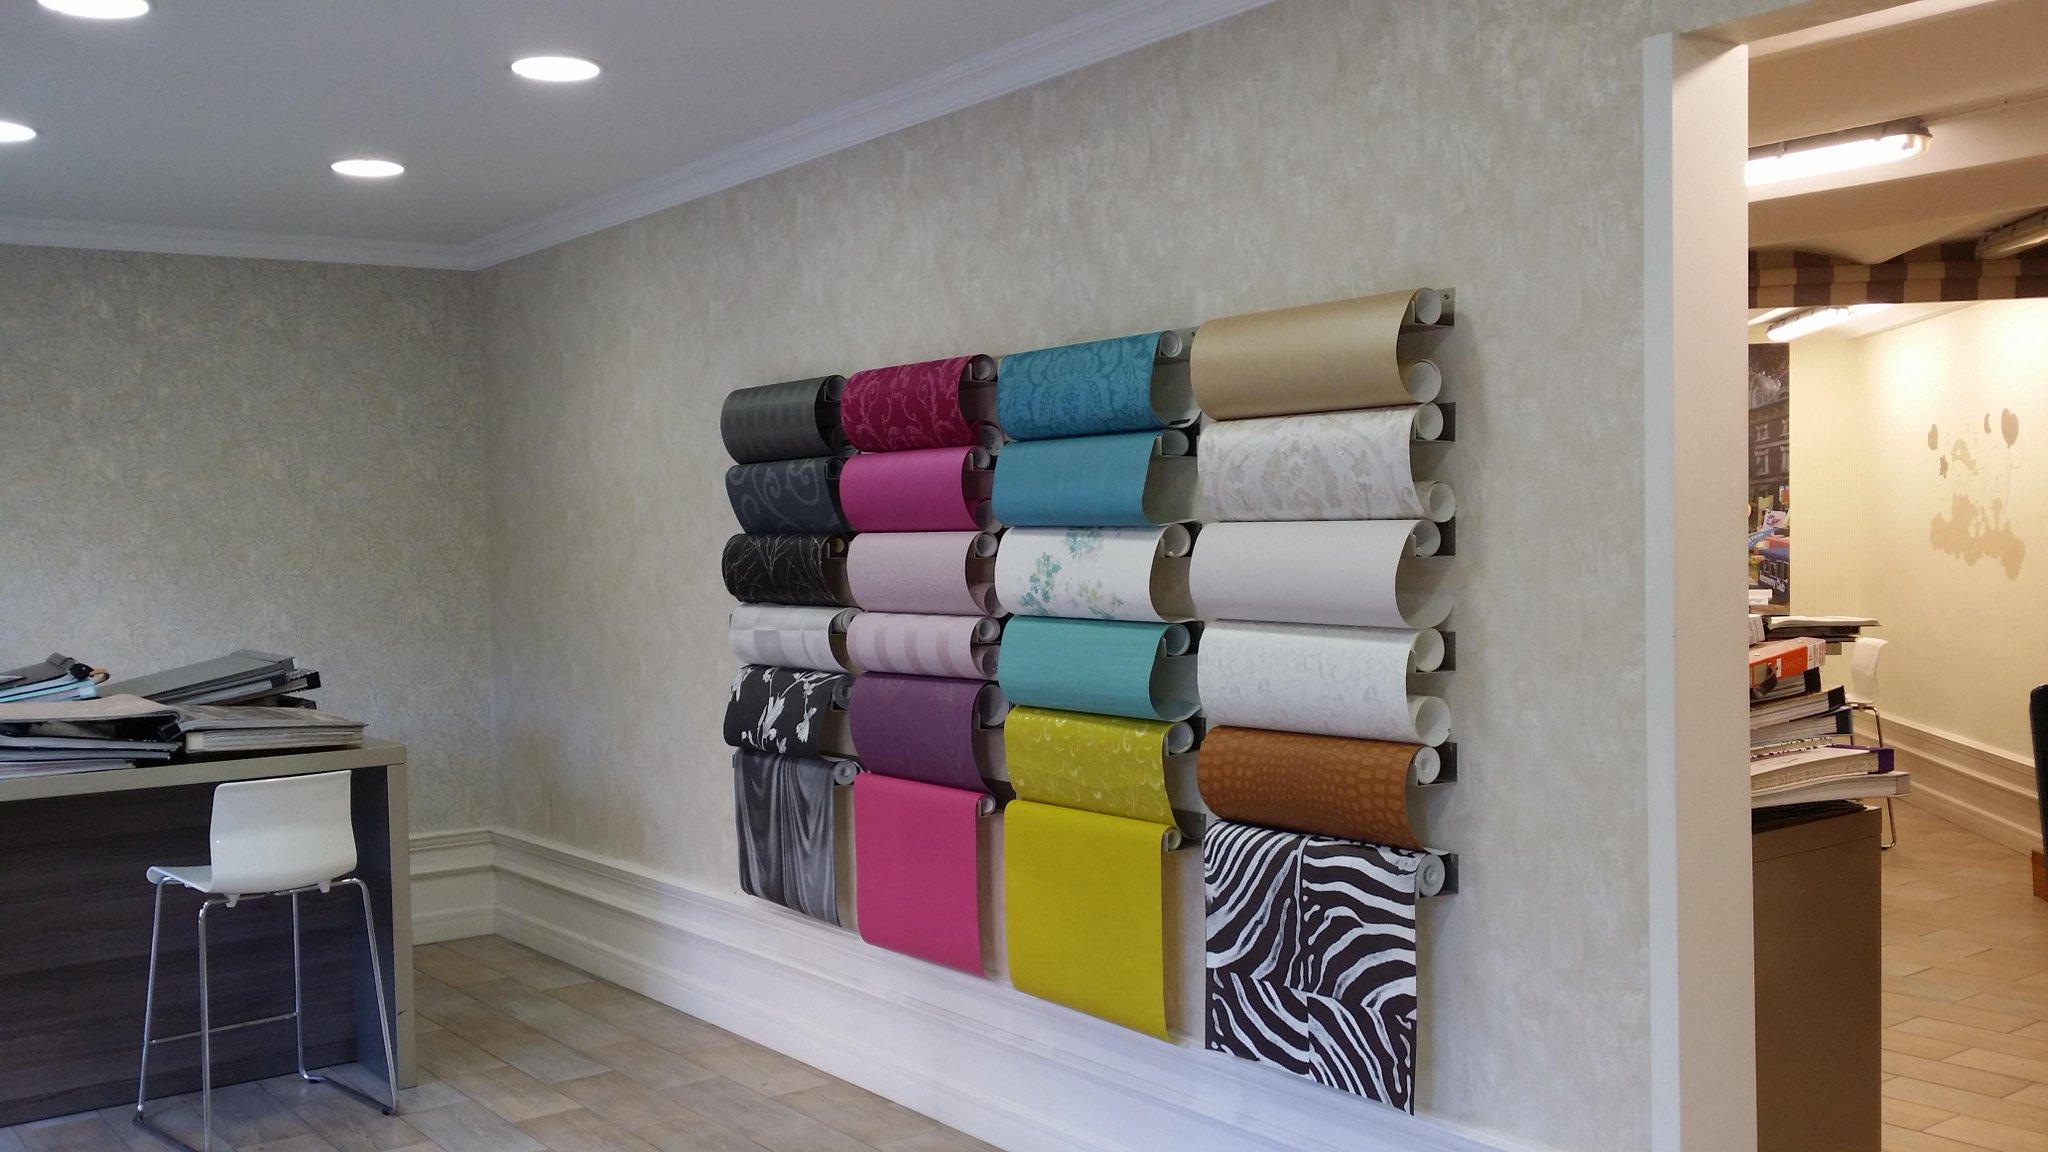 Papel pintado bcn on twitter papel pintado showroom - Papel pintado barcelona ...